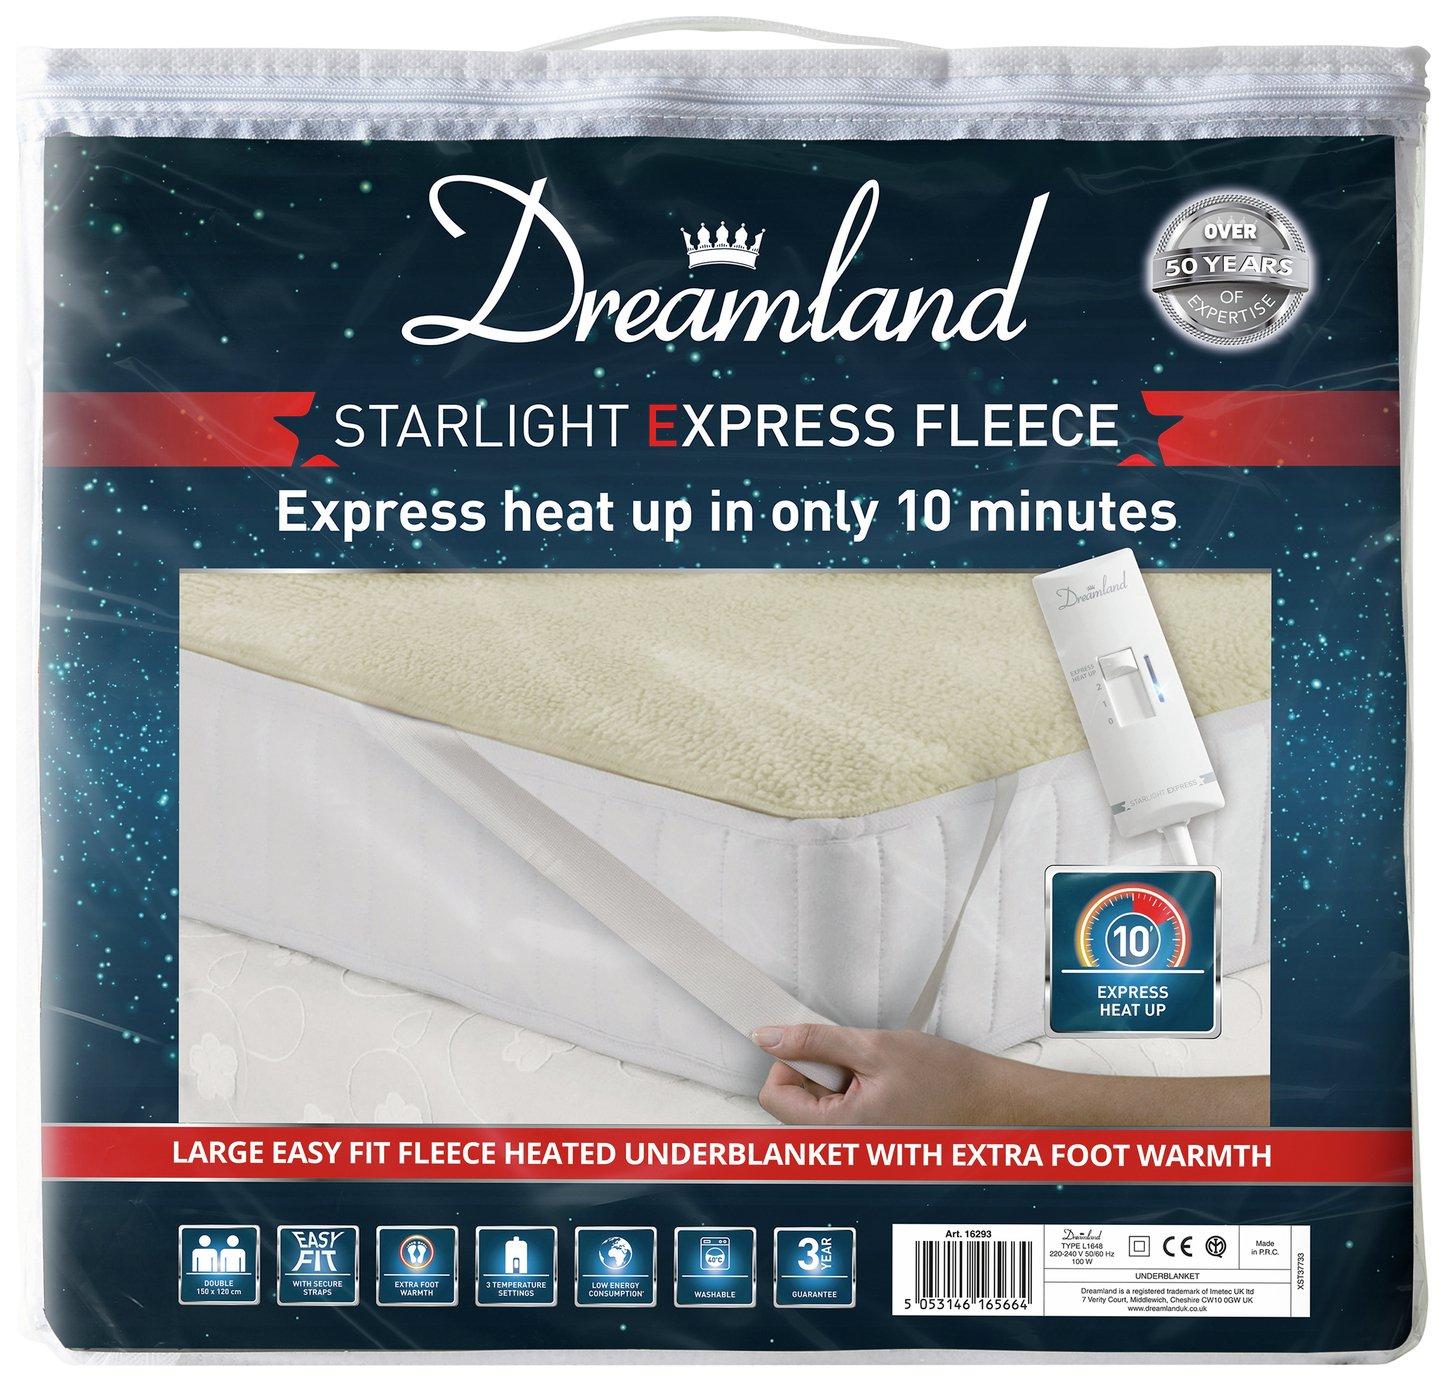 Dreamland Starlight Express Heated Underblanket - Double